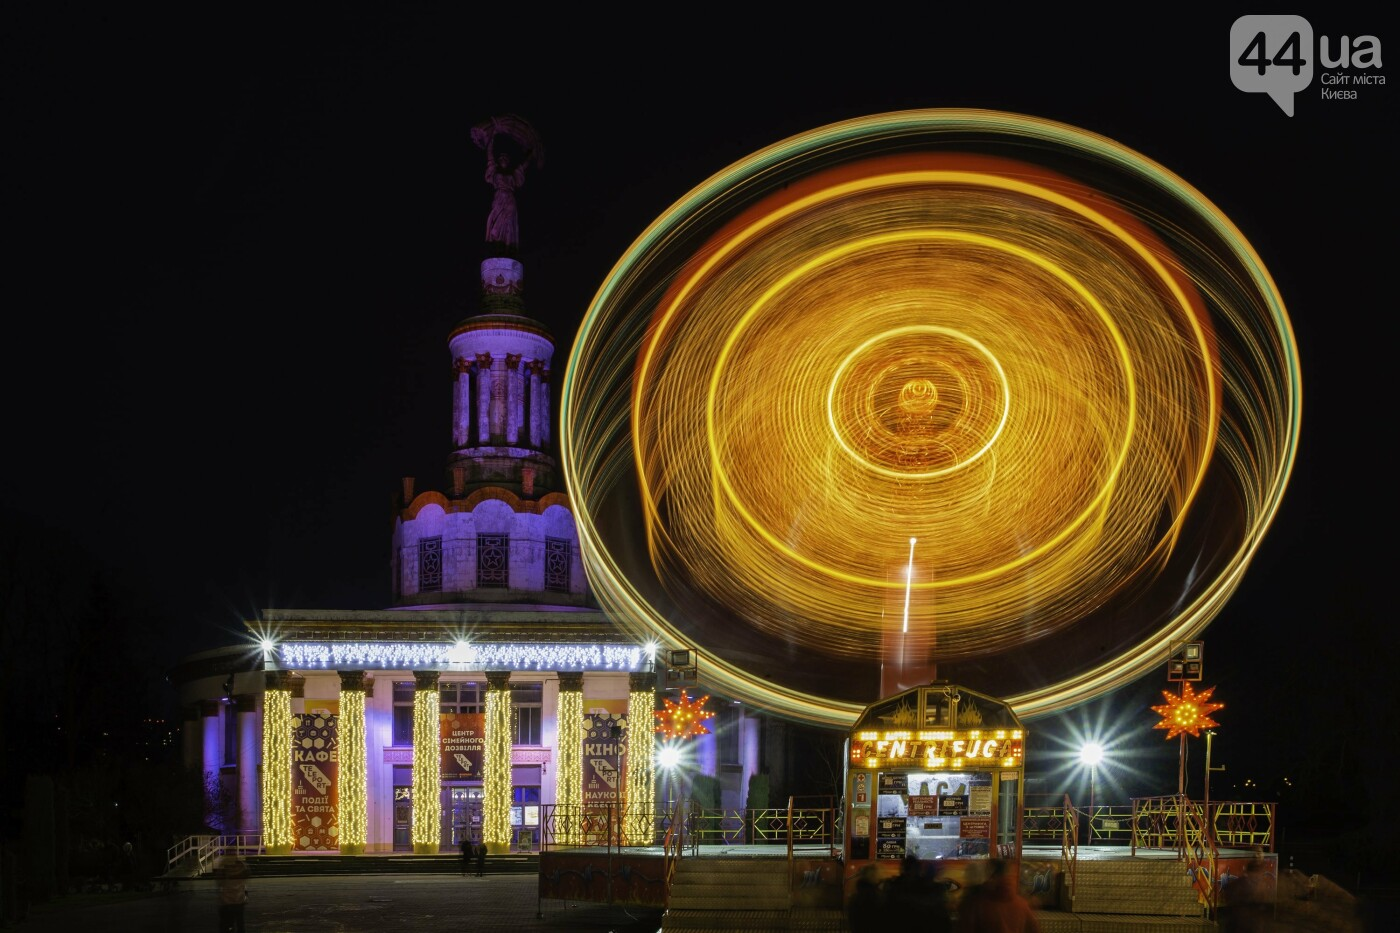 «Зимова країна на ВДНГ» снова объединит киевлян и гостей столицы, фото-2